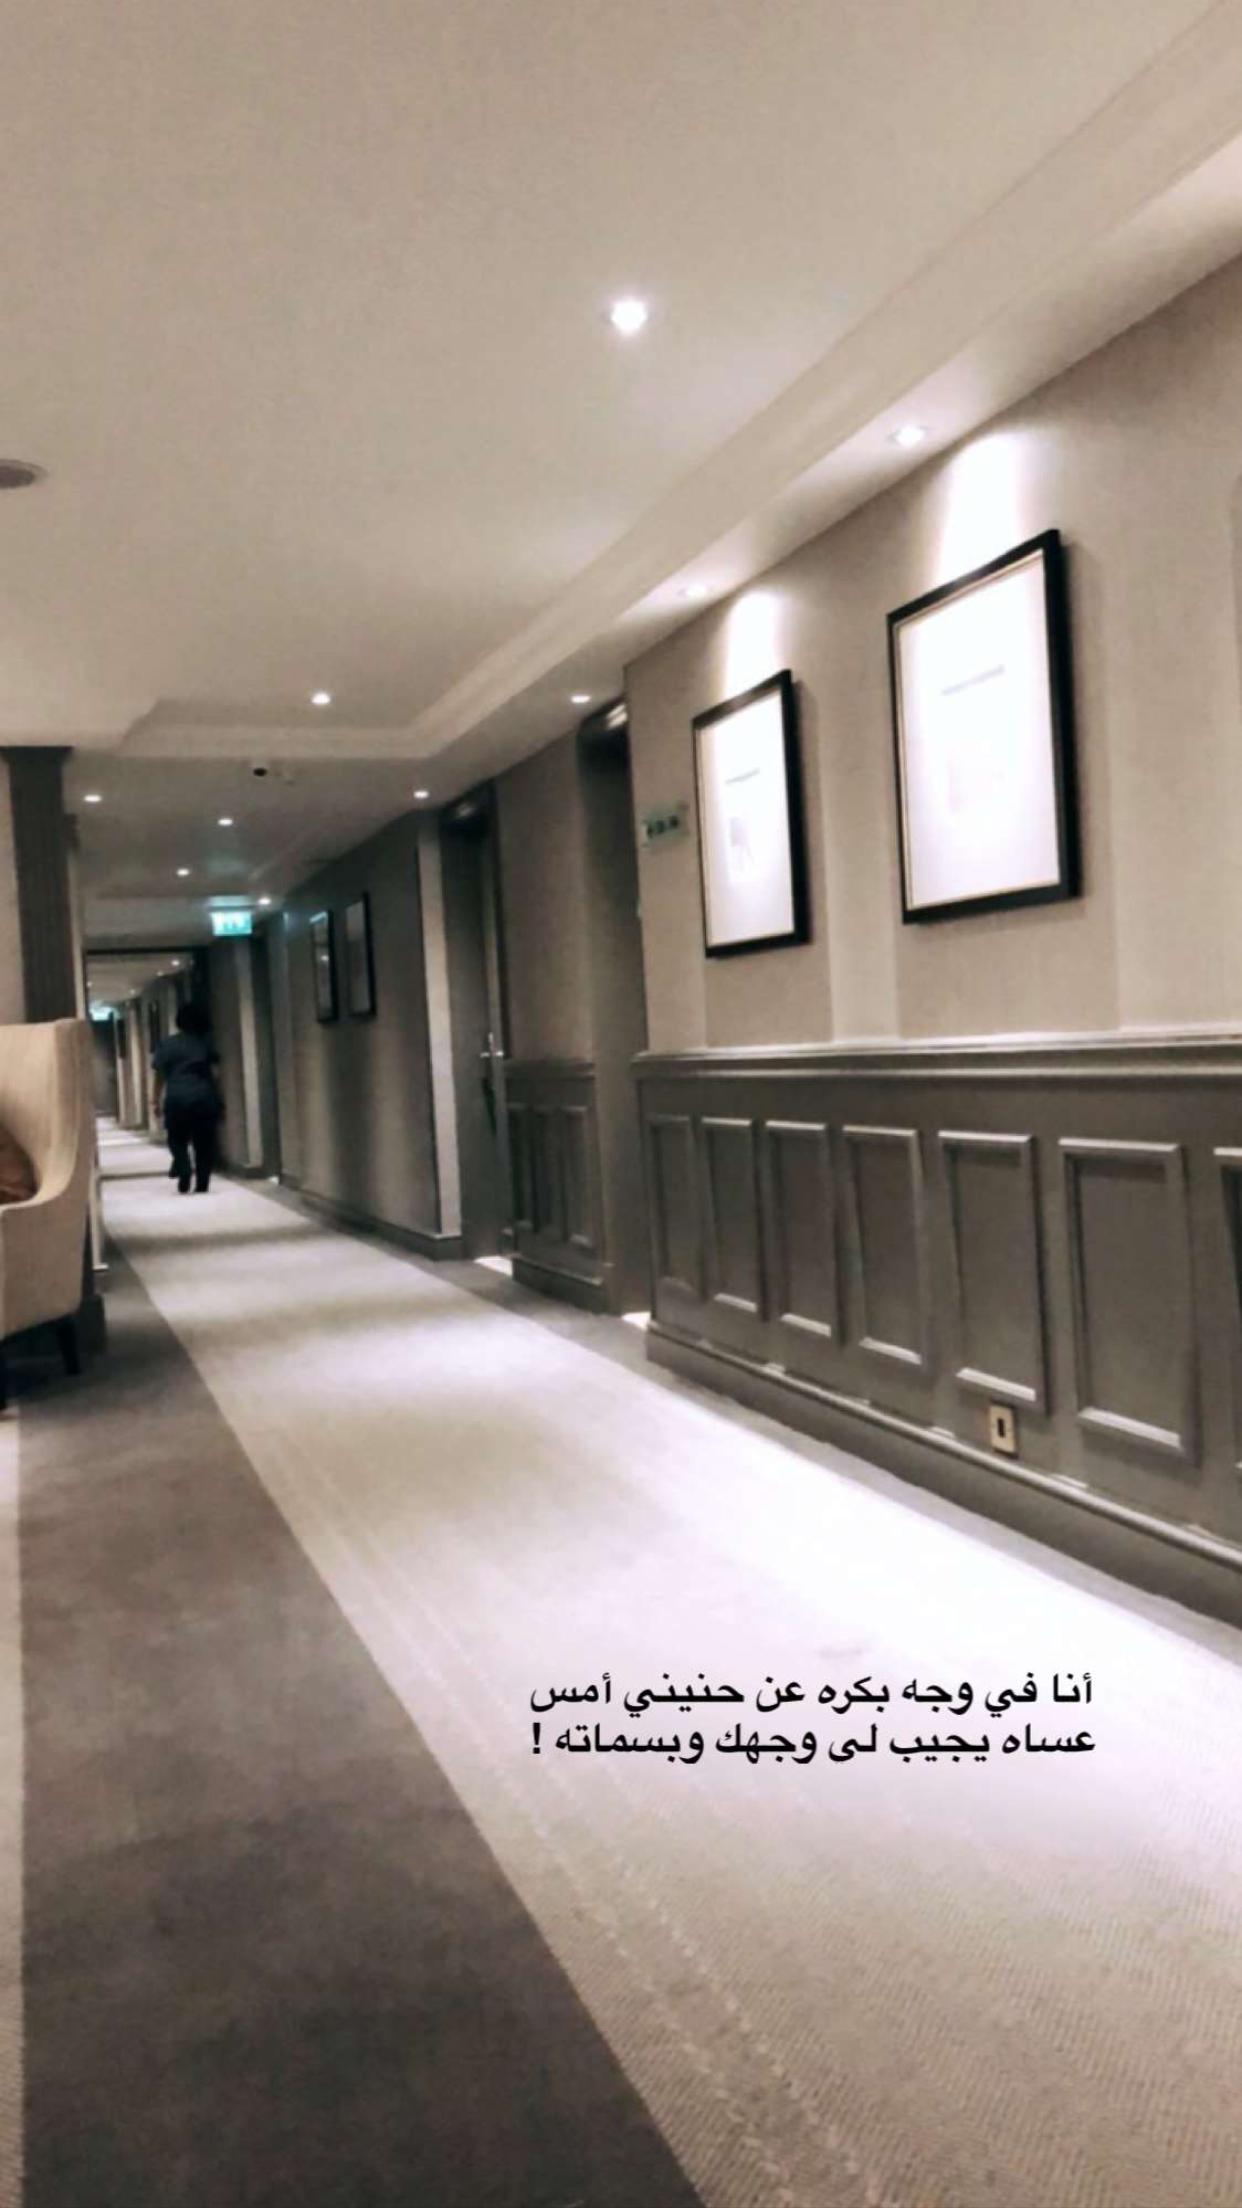 Writing Beautiful Arabic Words Islamic Quotes Wallpaper Cute Selfie Ideas